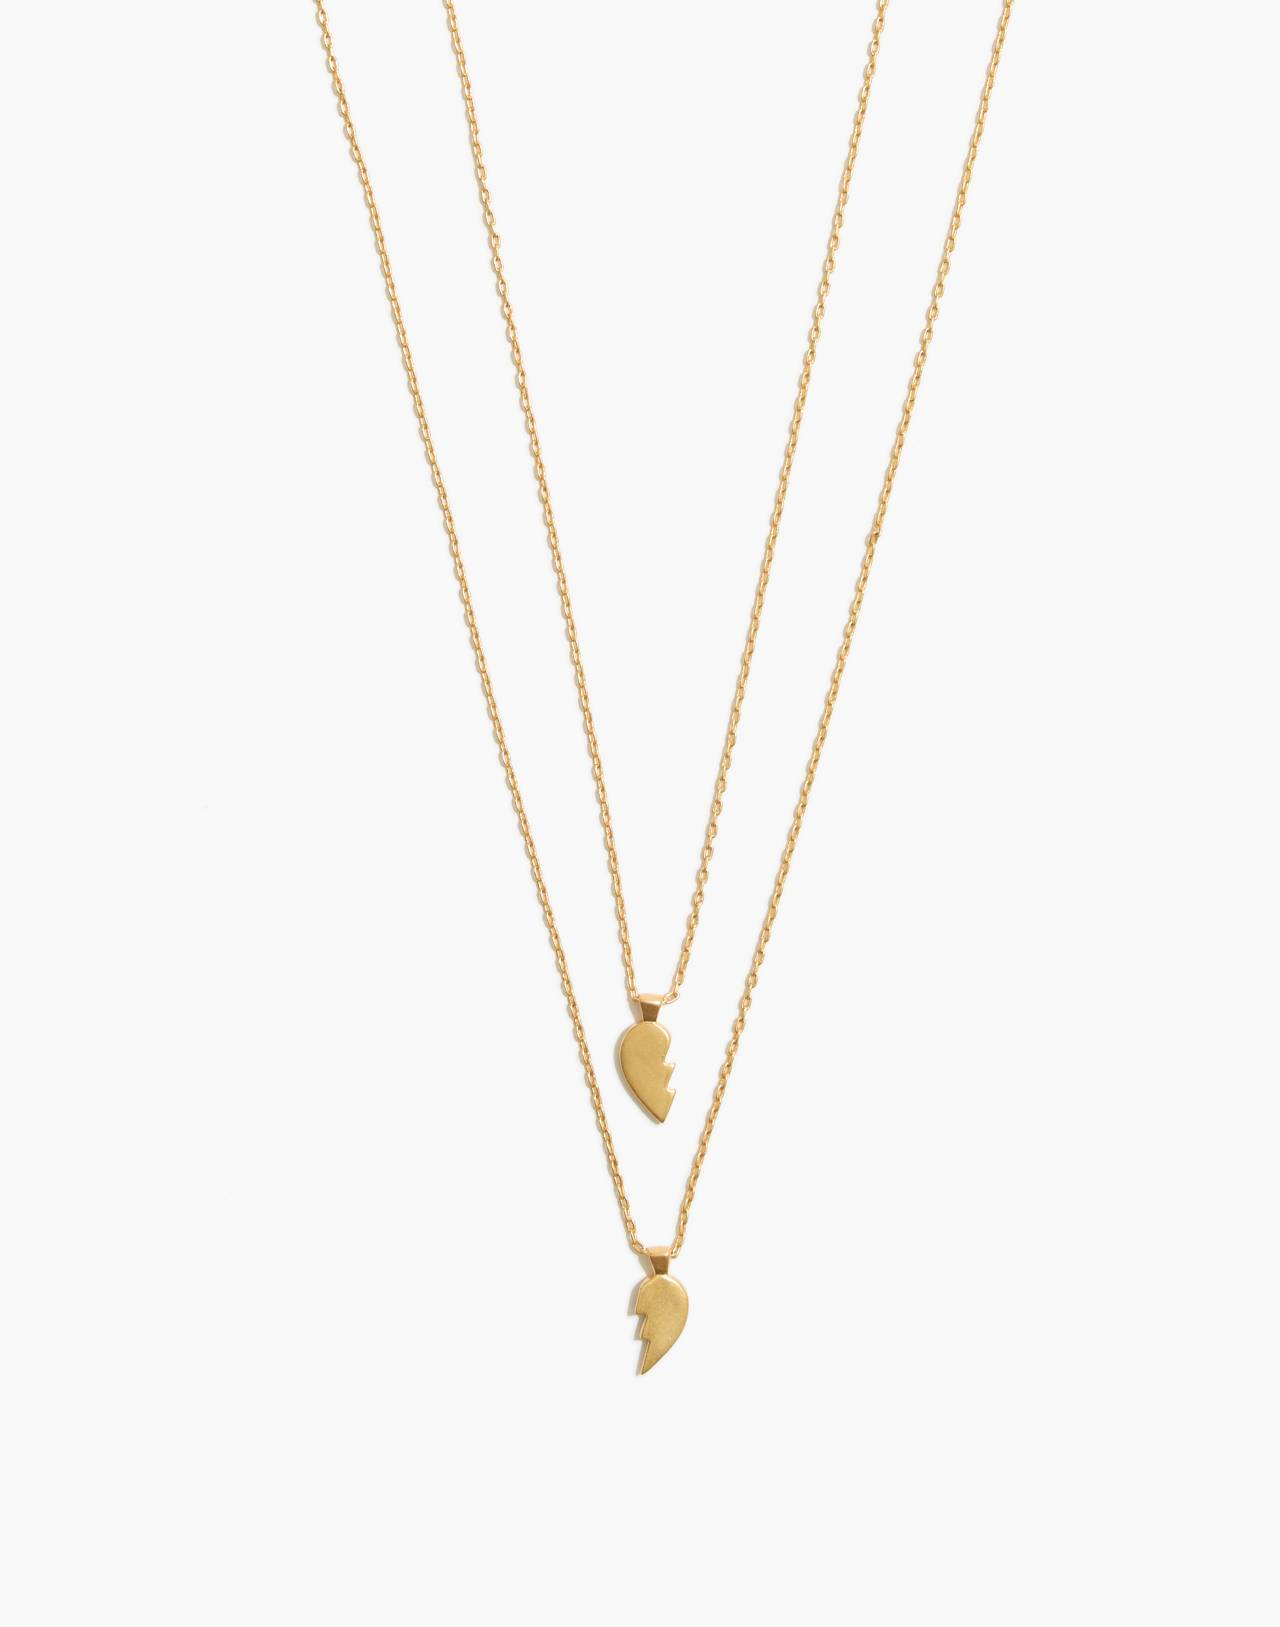 Heartbreak Friendship Necklace Set in vintage gold image 1